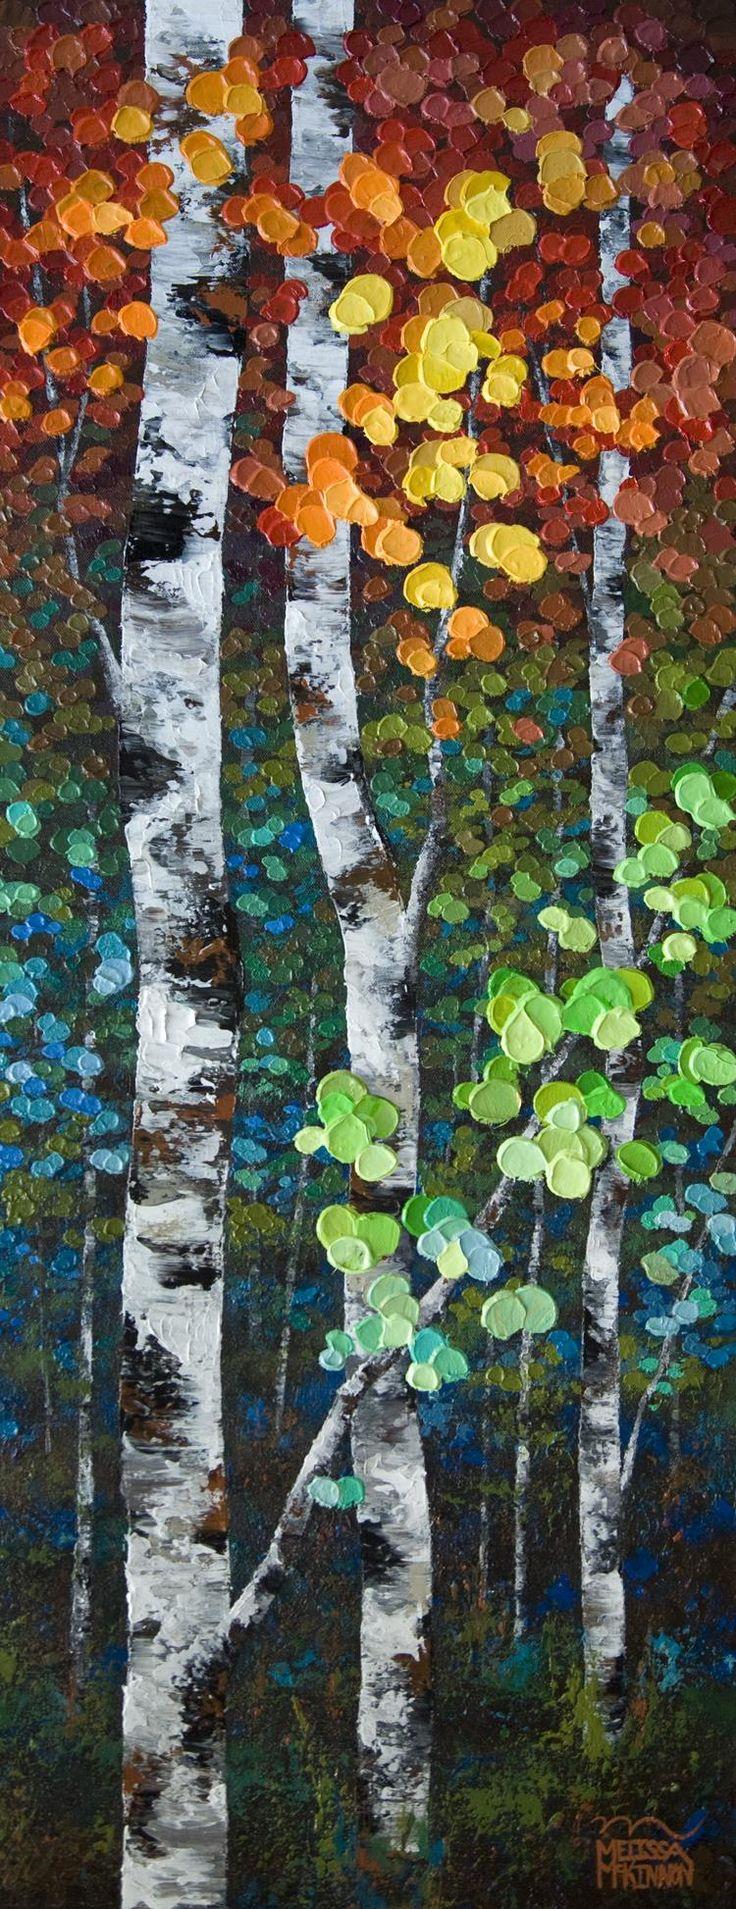 New Painting Commission u201cFirst Impressionu201d Colourful Autumn